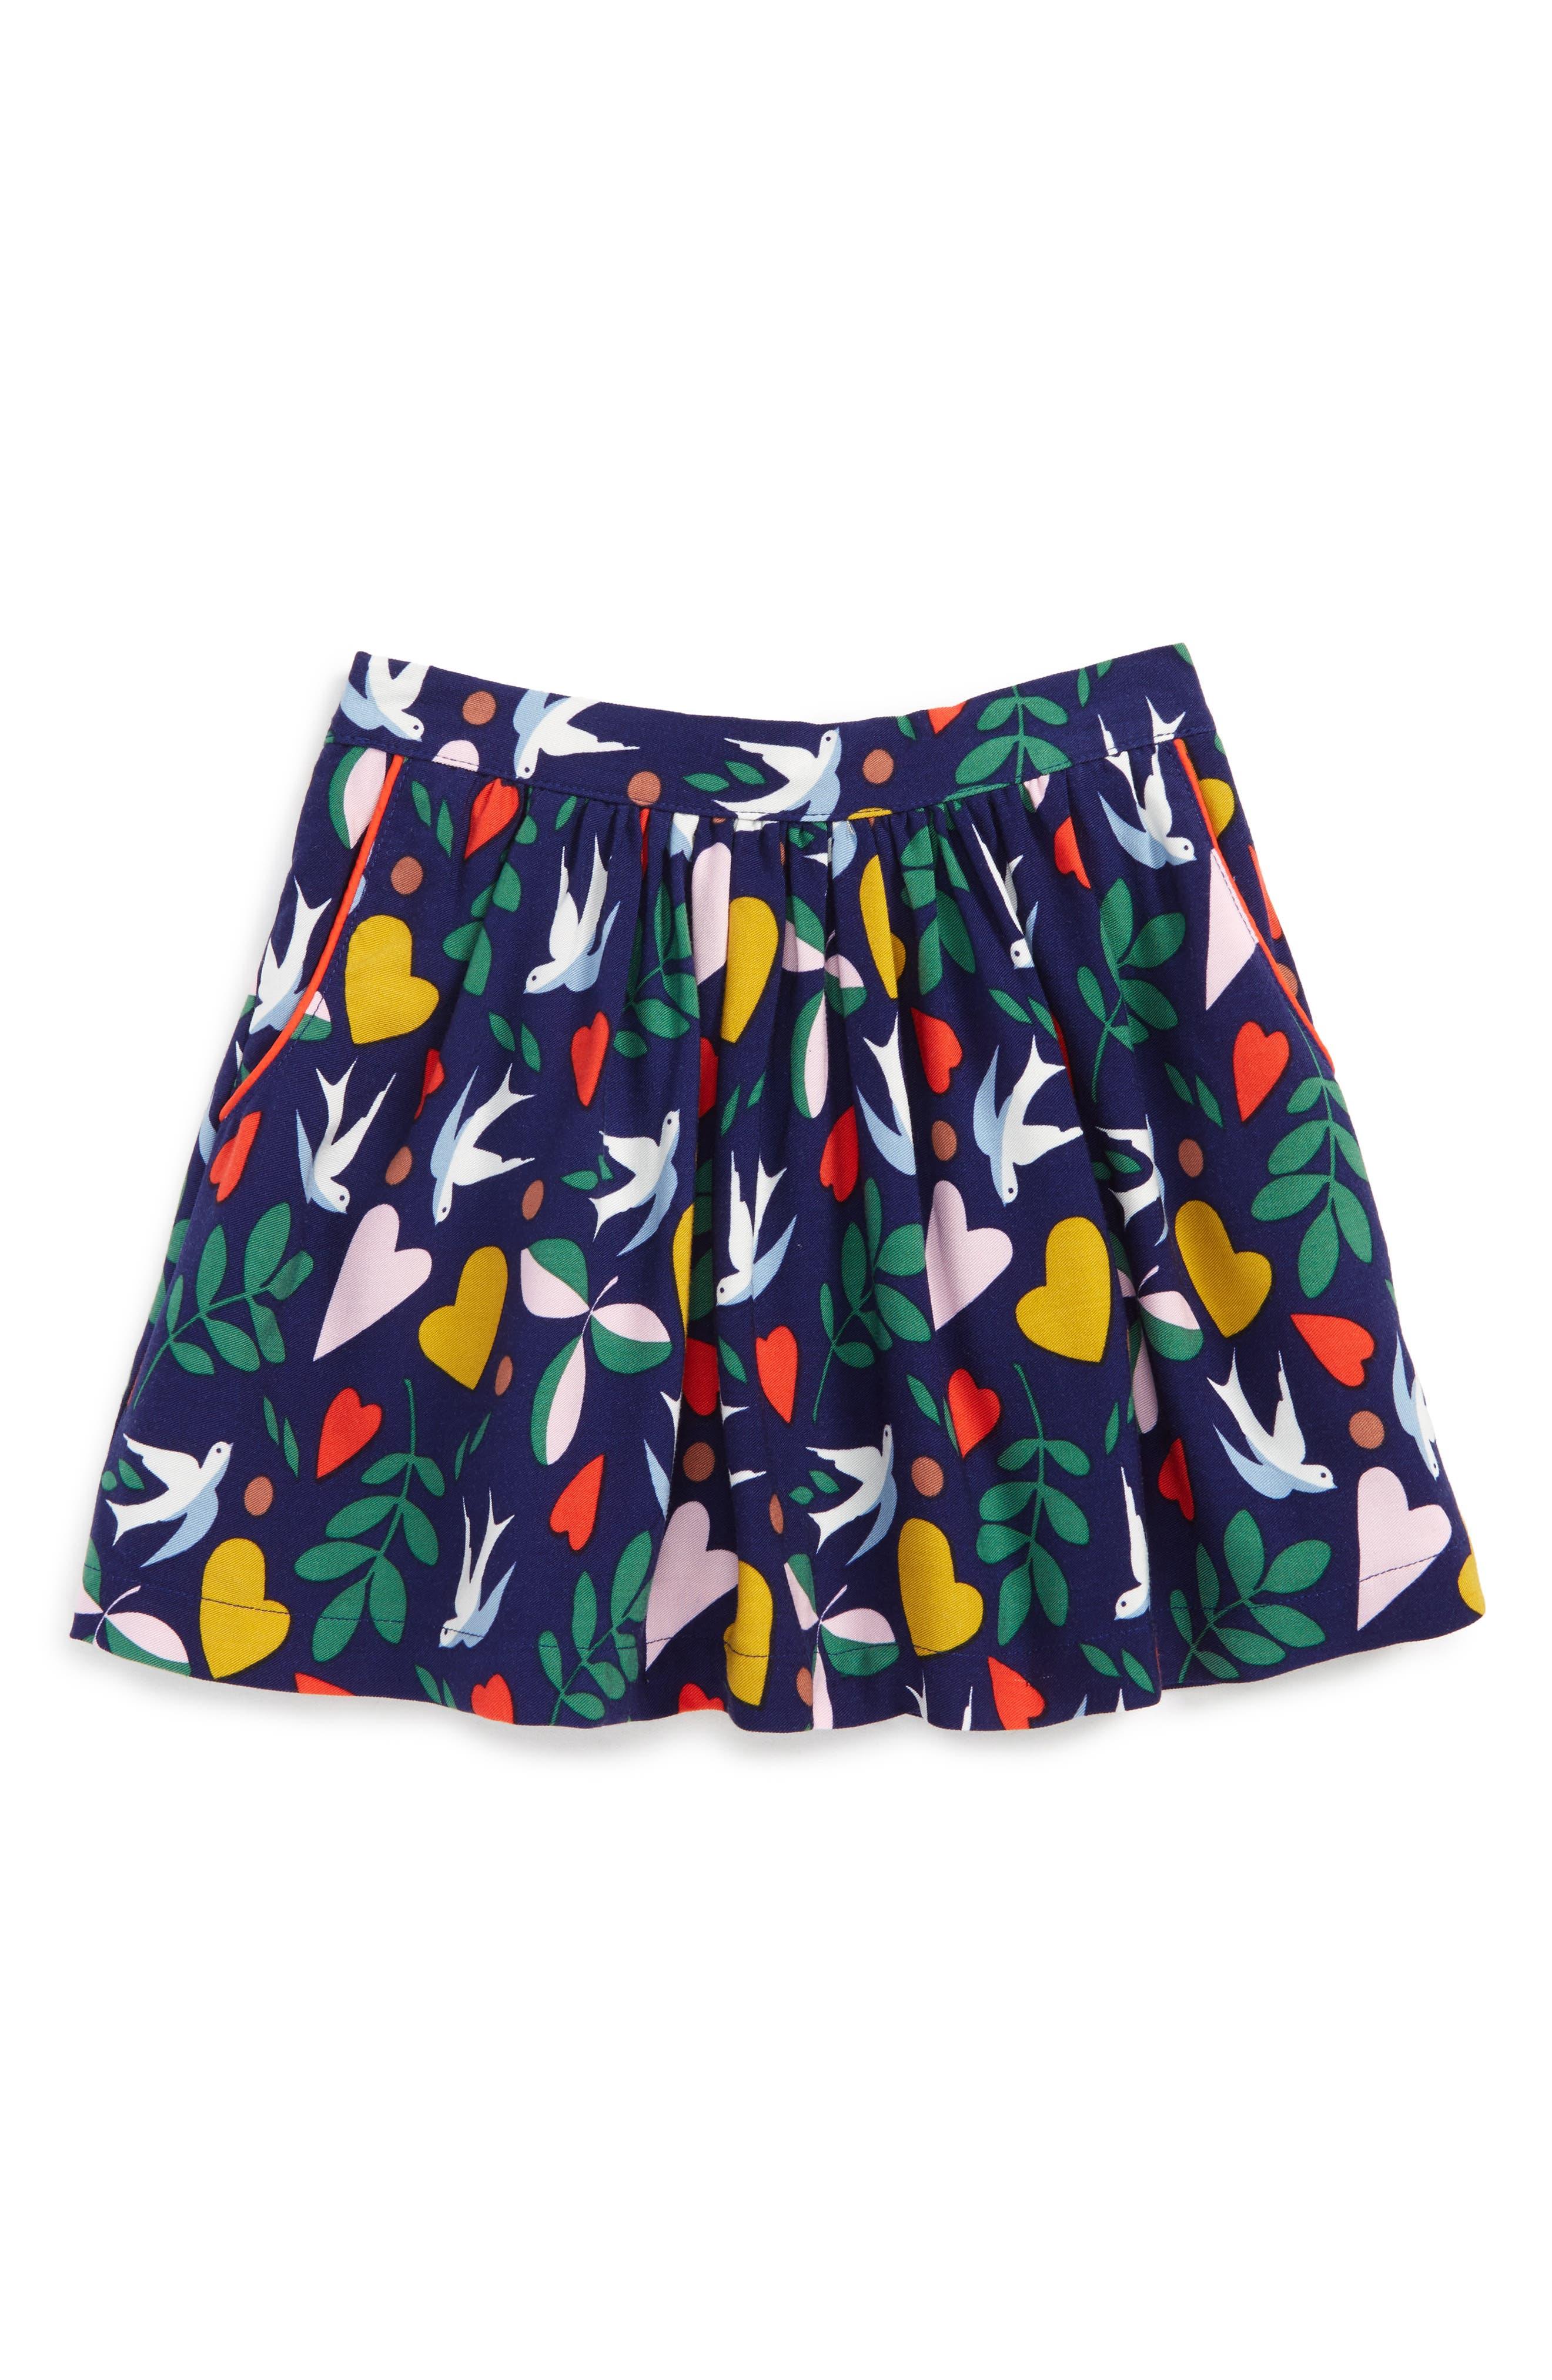 Main Image - Mini Boden Print Twirly Skirt (Toddler Girls, Little Girls & Big Girls)